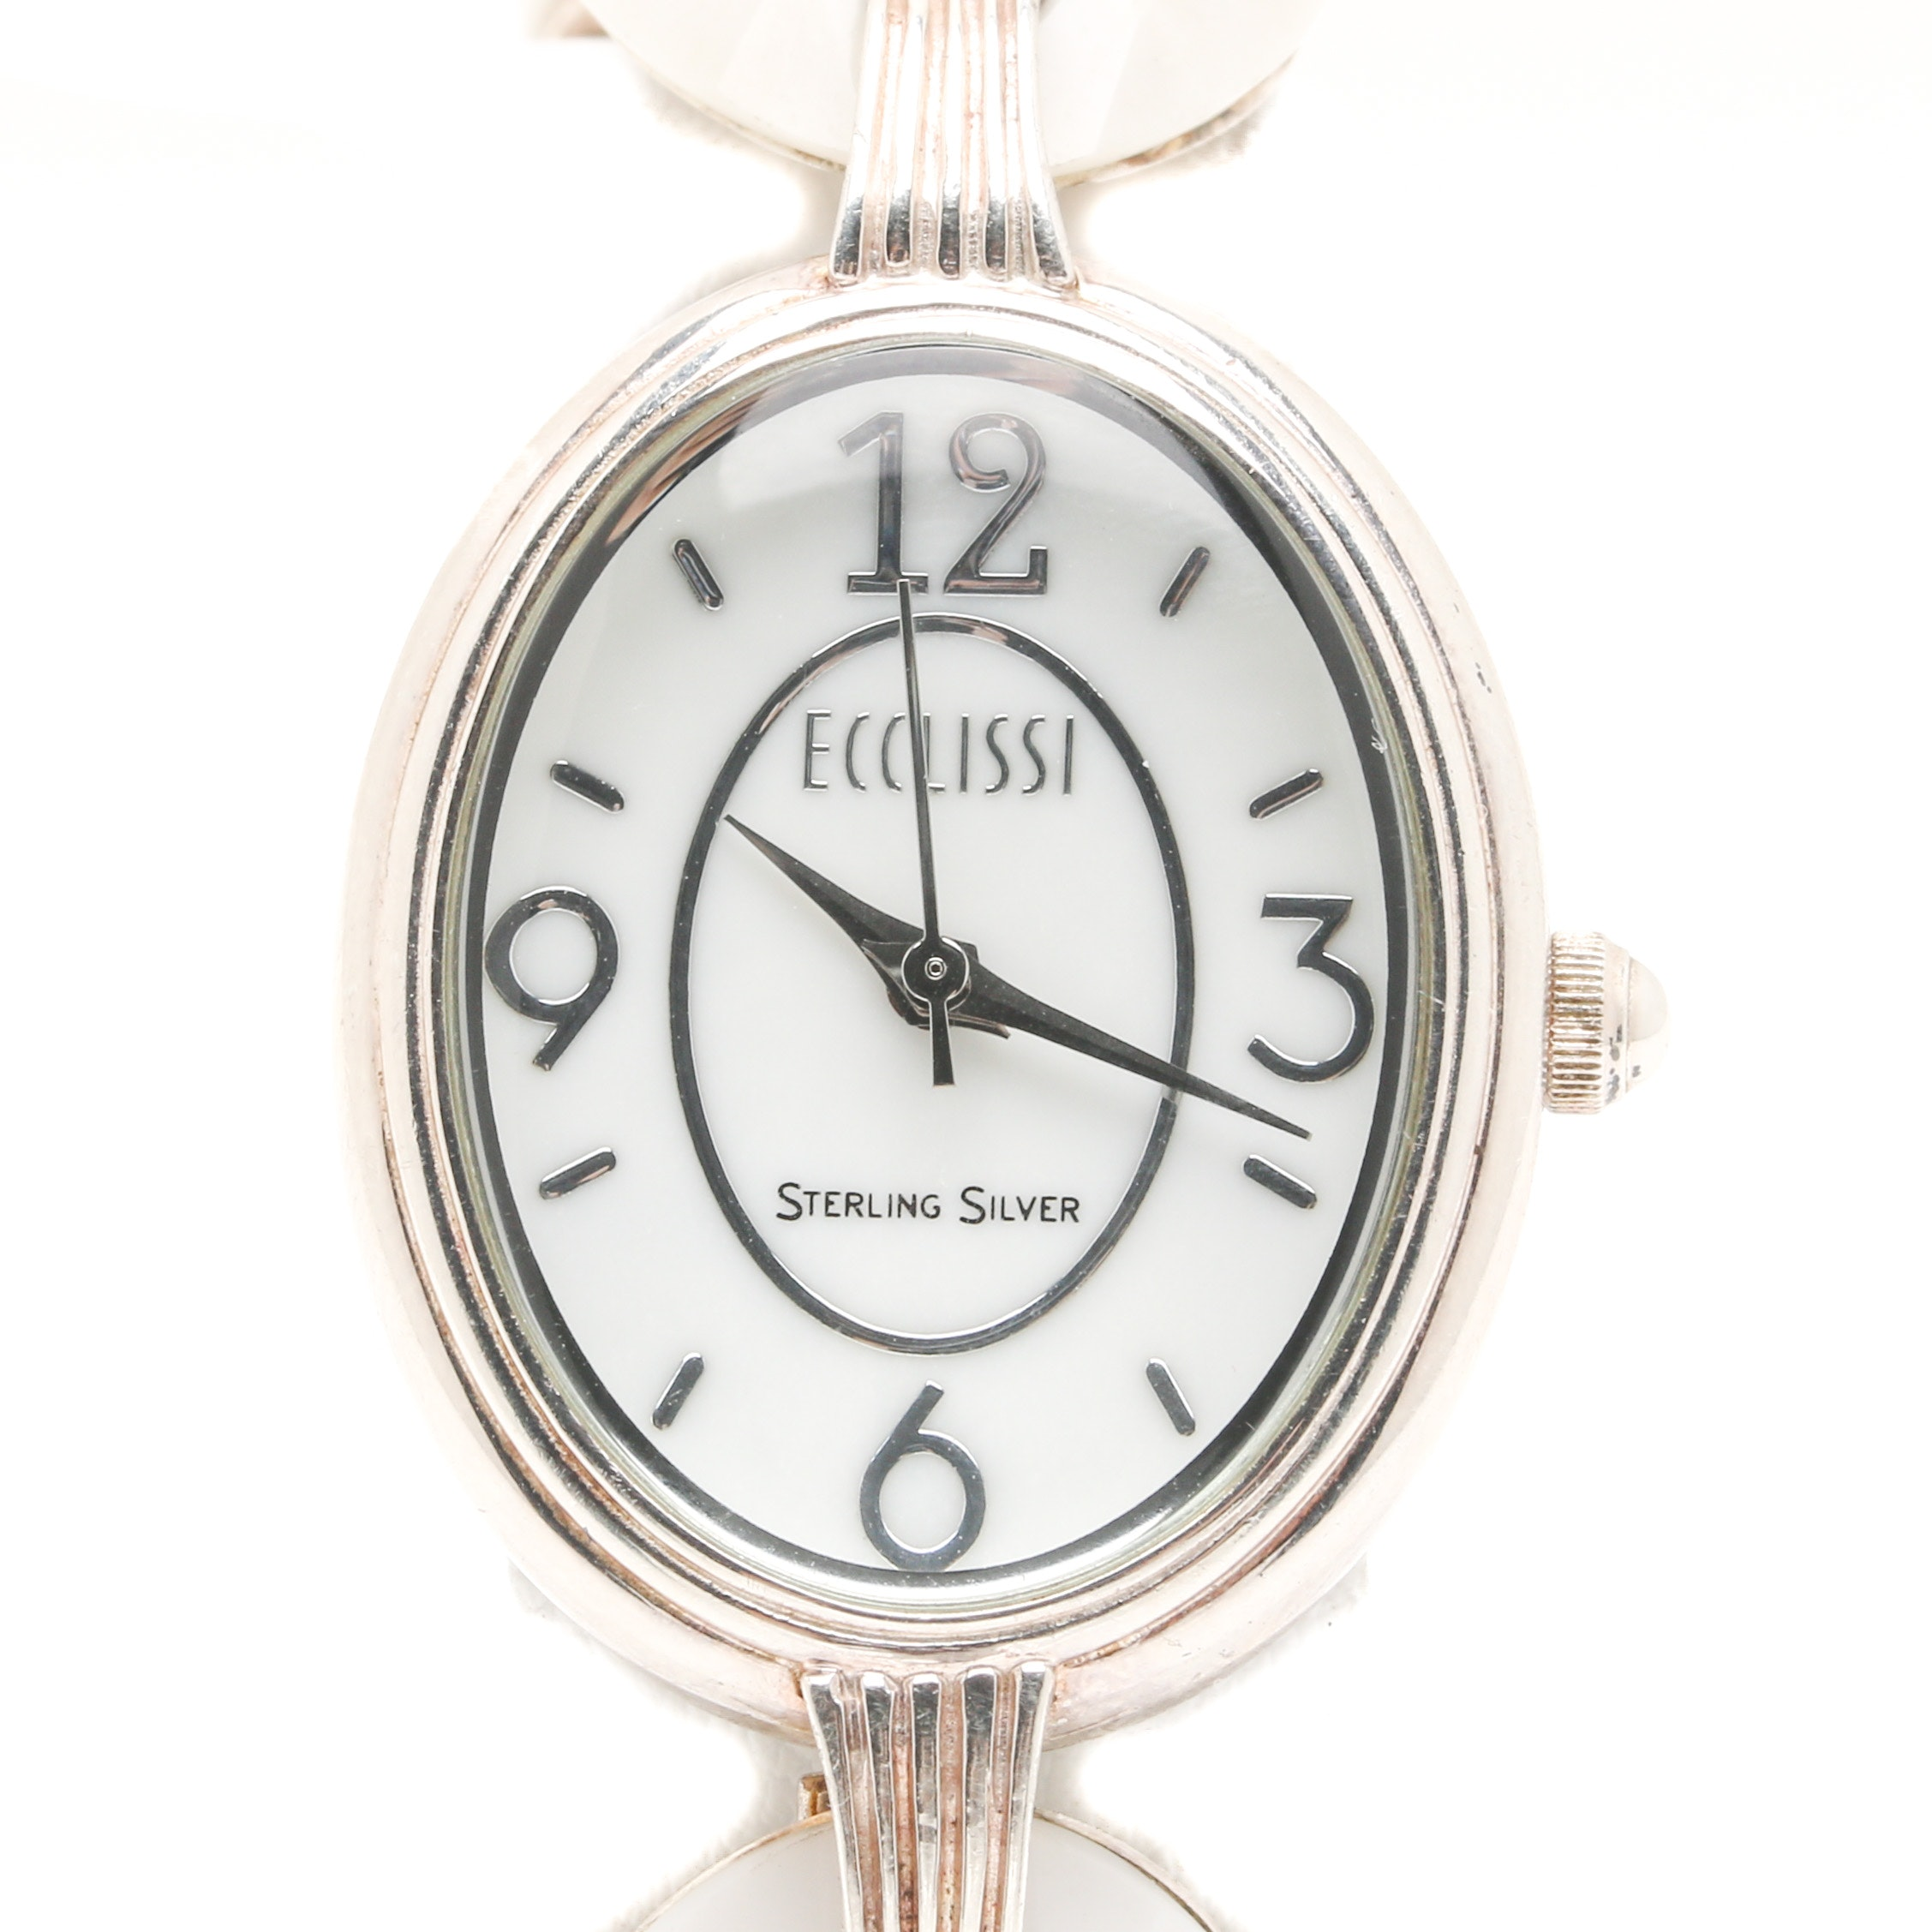 Sterling Silver Ecclissi Fashion Wristwatch